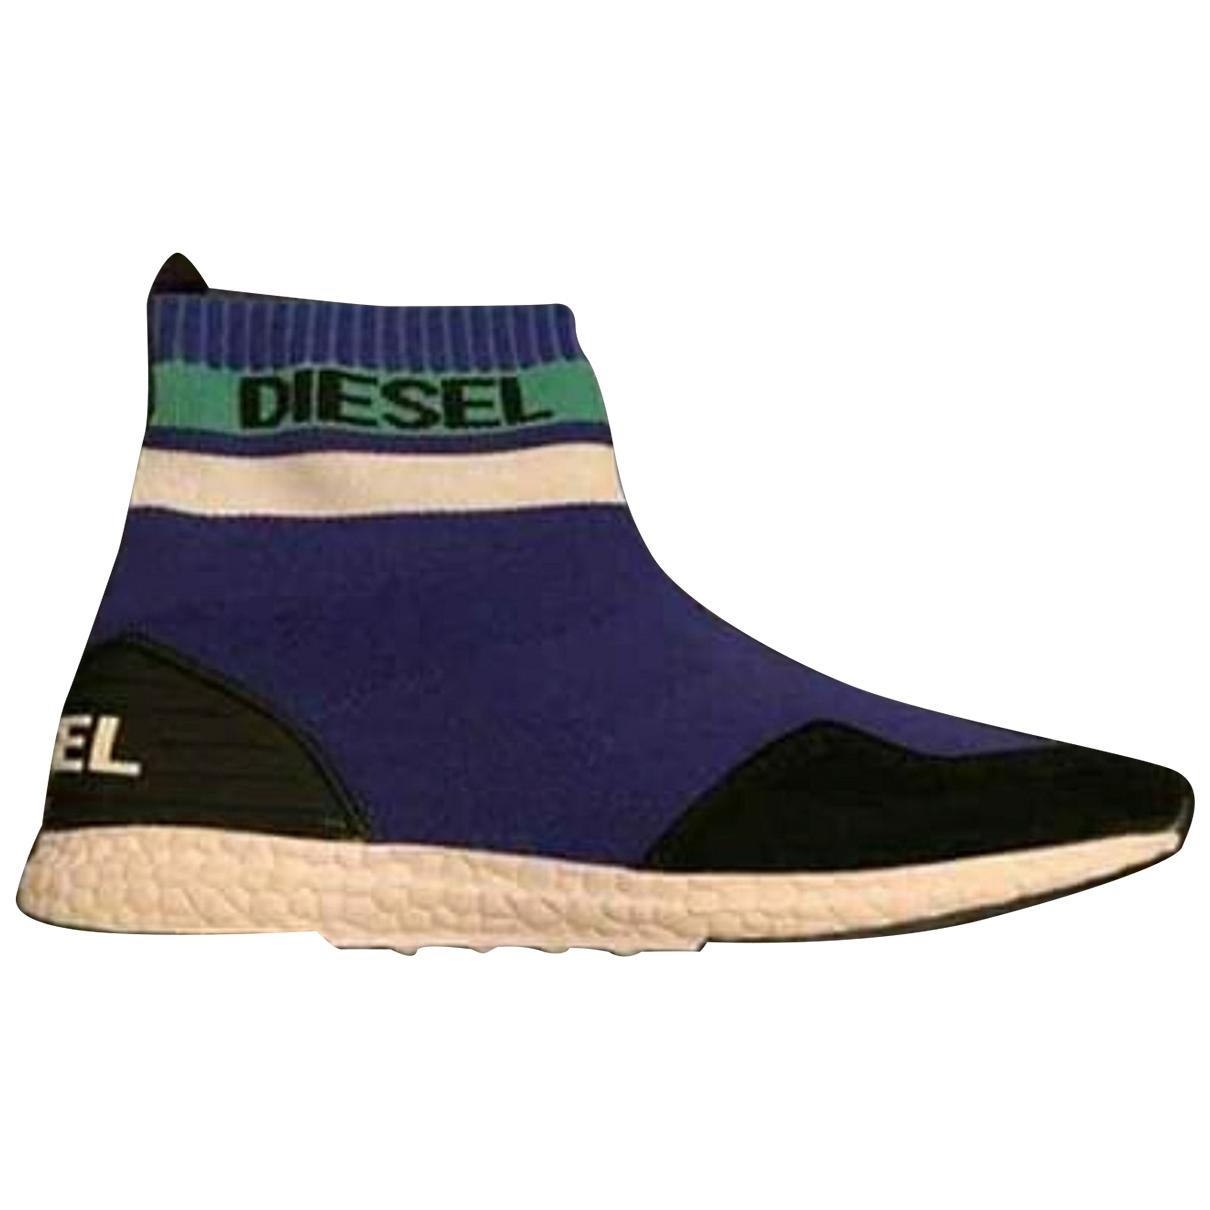 Diesel \N Blue Trainers for Women 38 EU